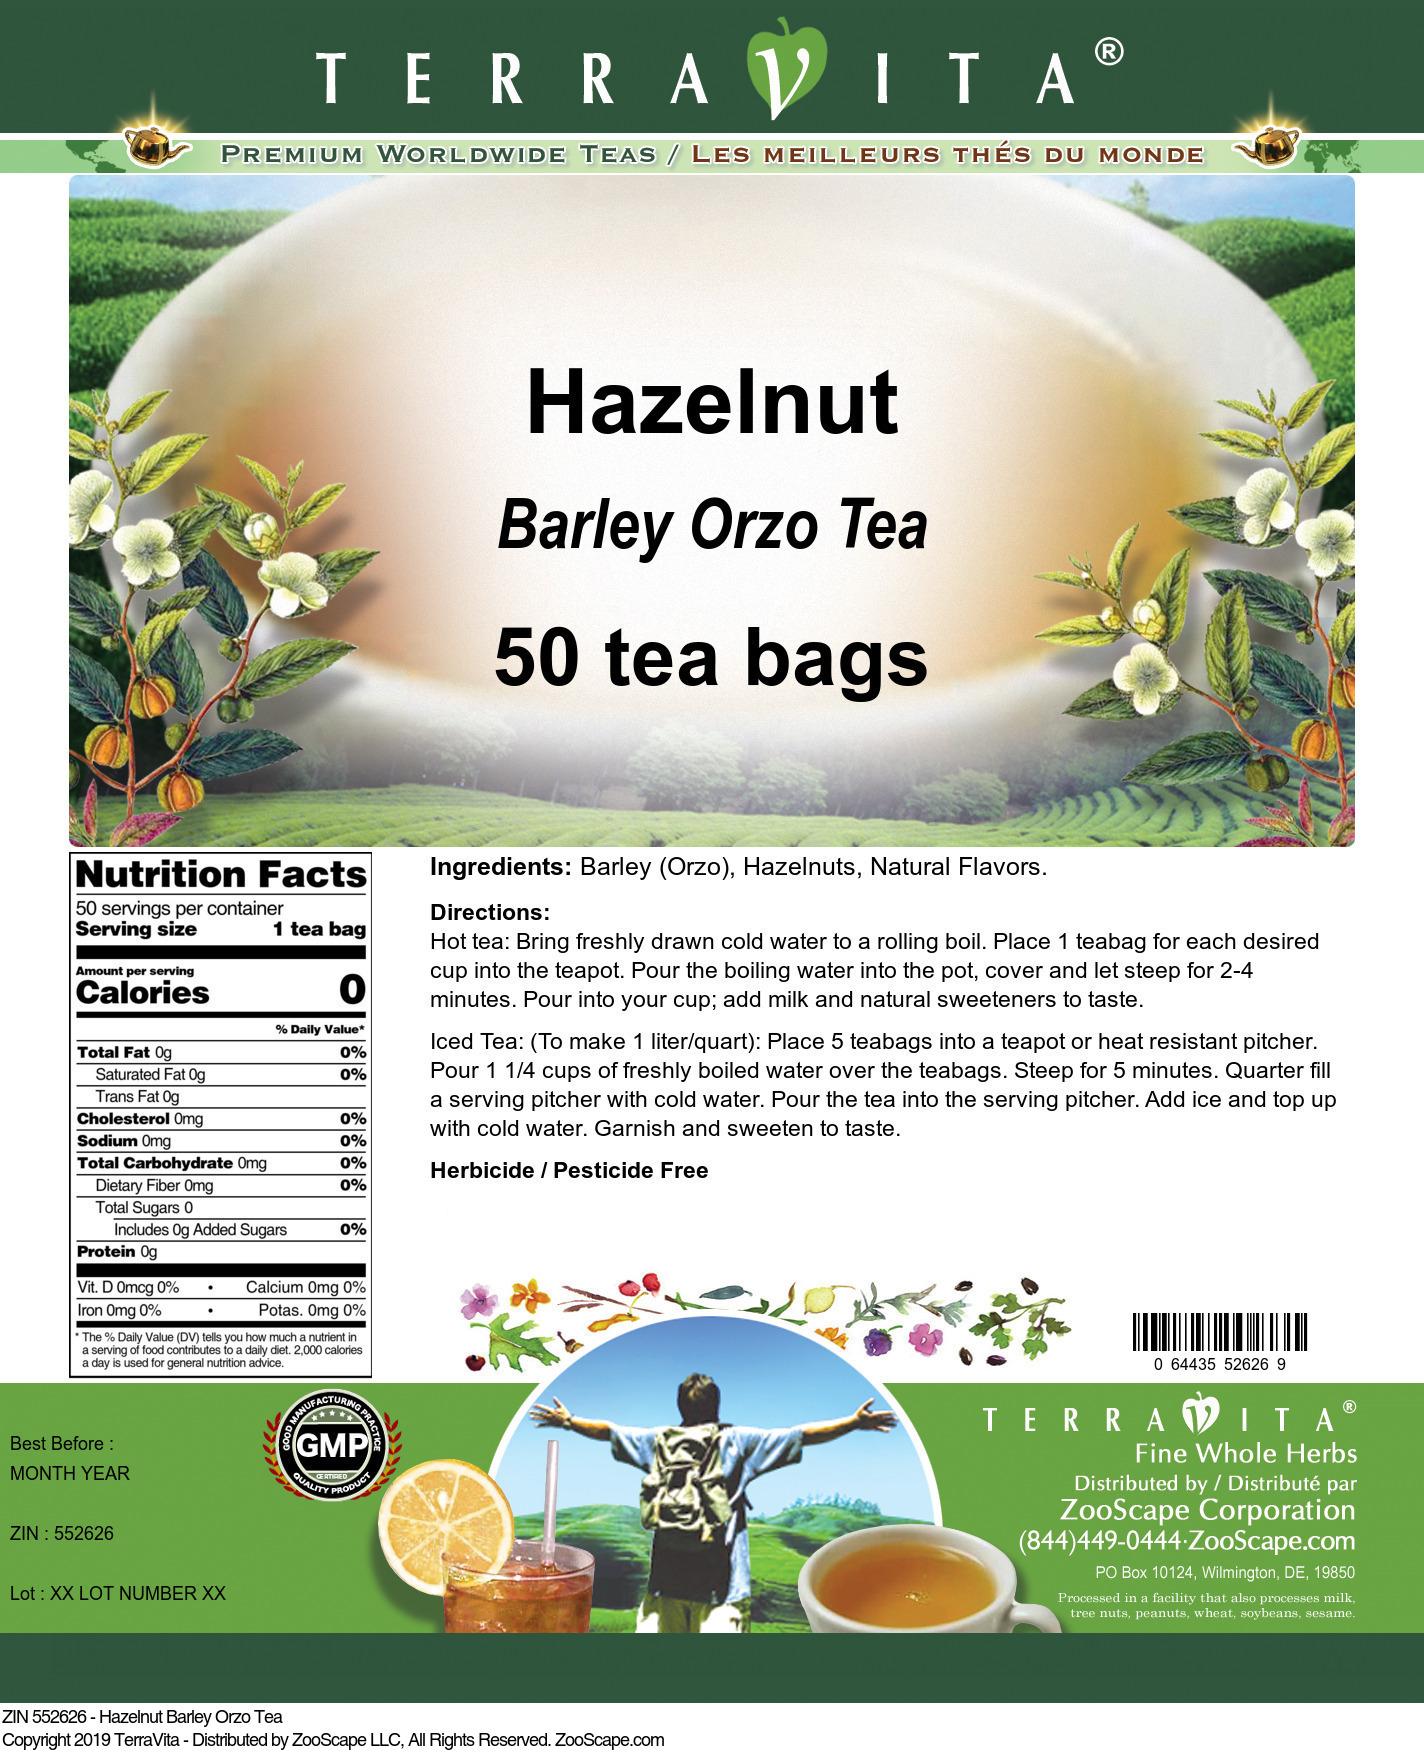 Hazelnut Barley Orzo Tea